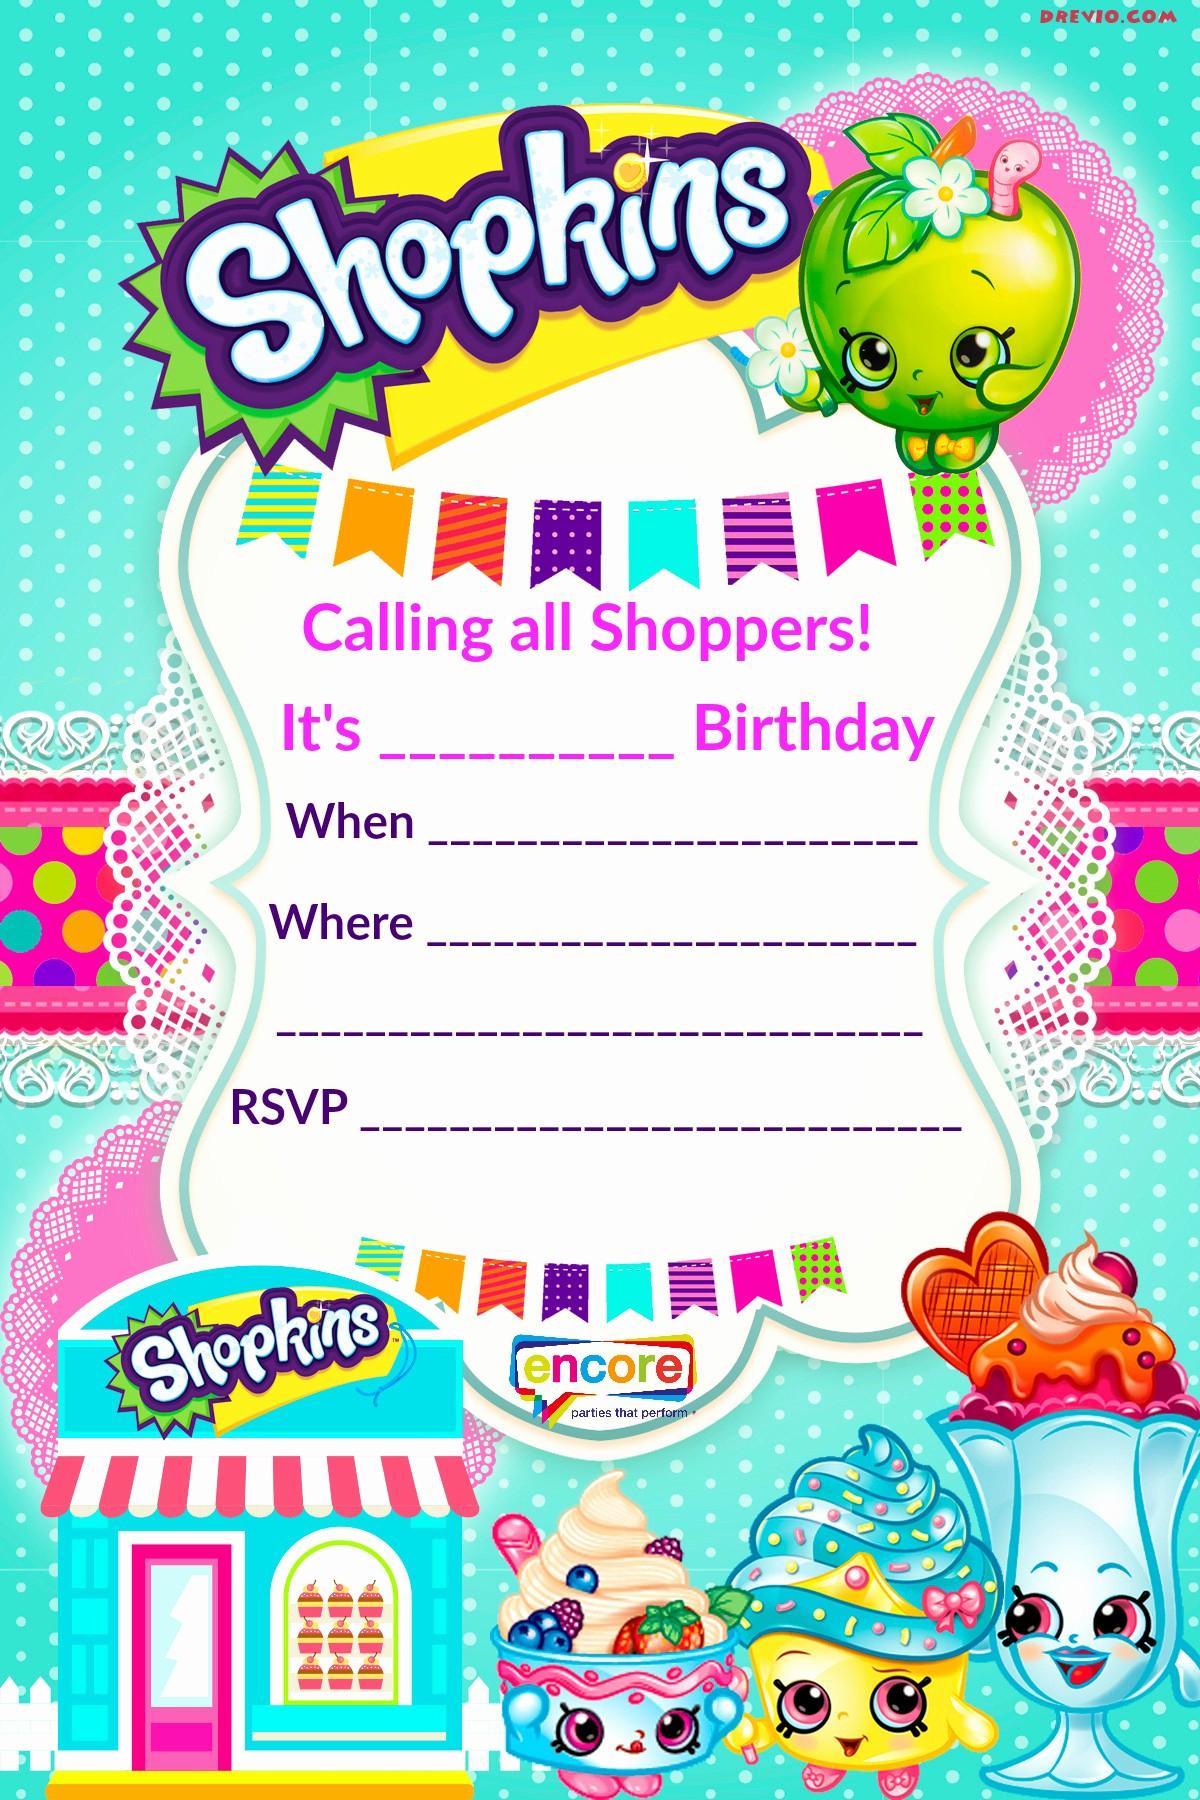 Free Templates for Birthday Invitations Elegant Updated – Free Printable Shopkins Birthday Invitation